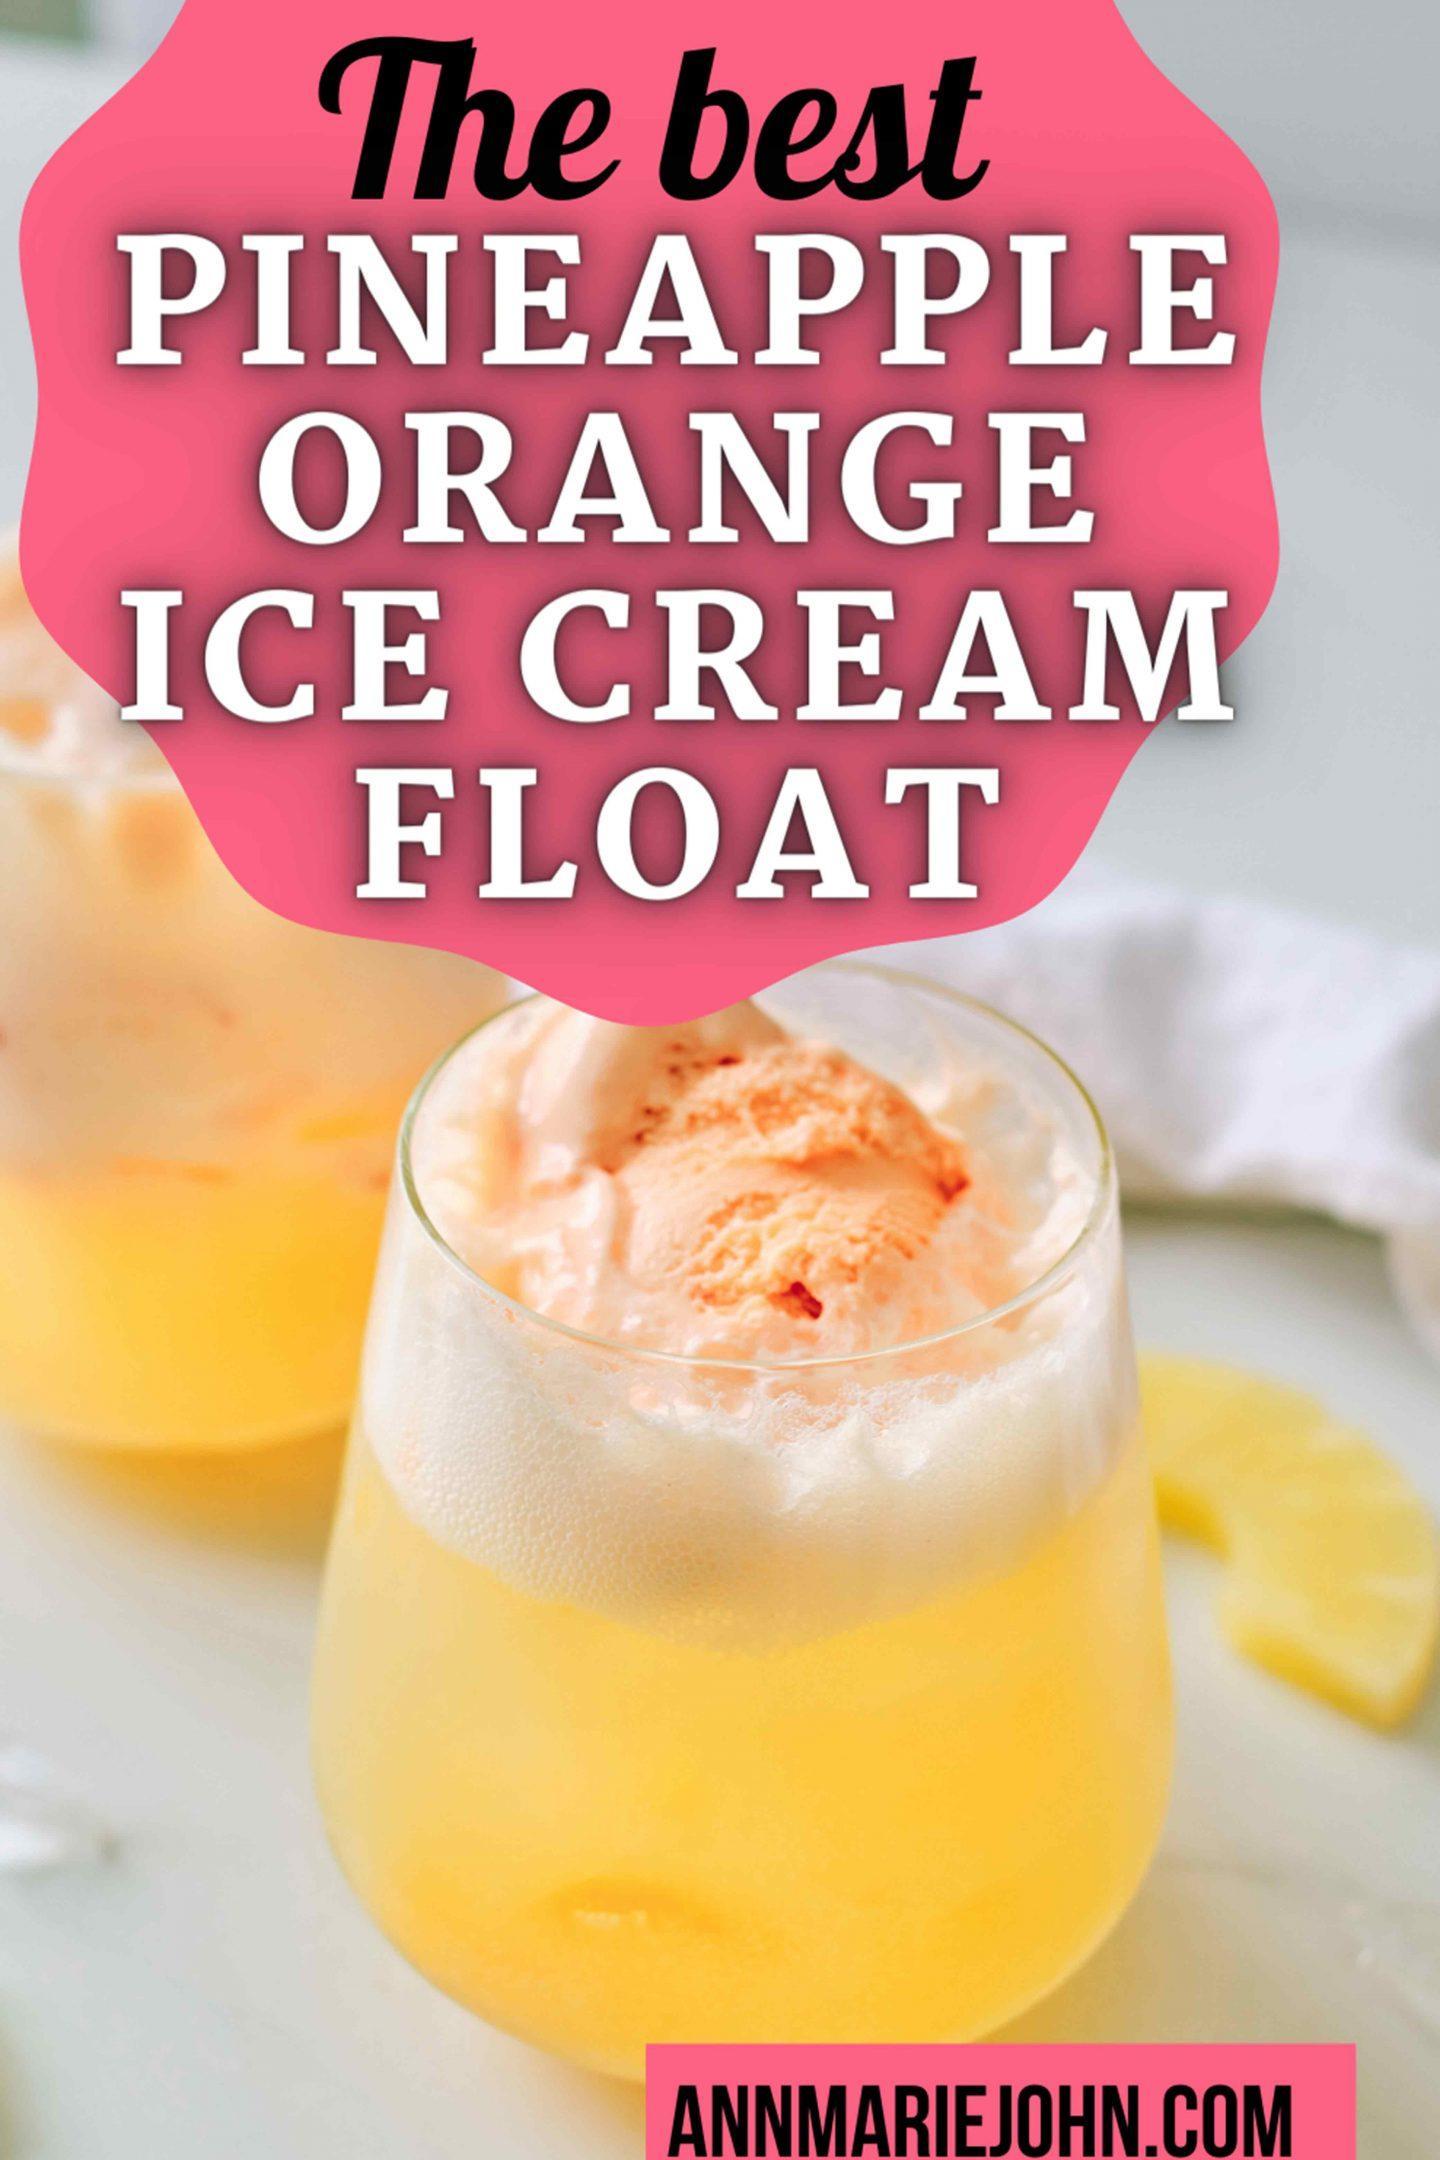 Pineapple Orange Ice Cream Float